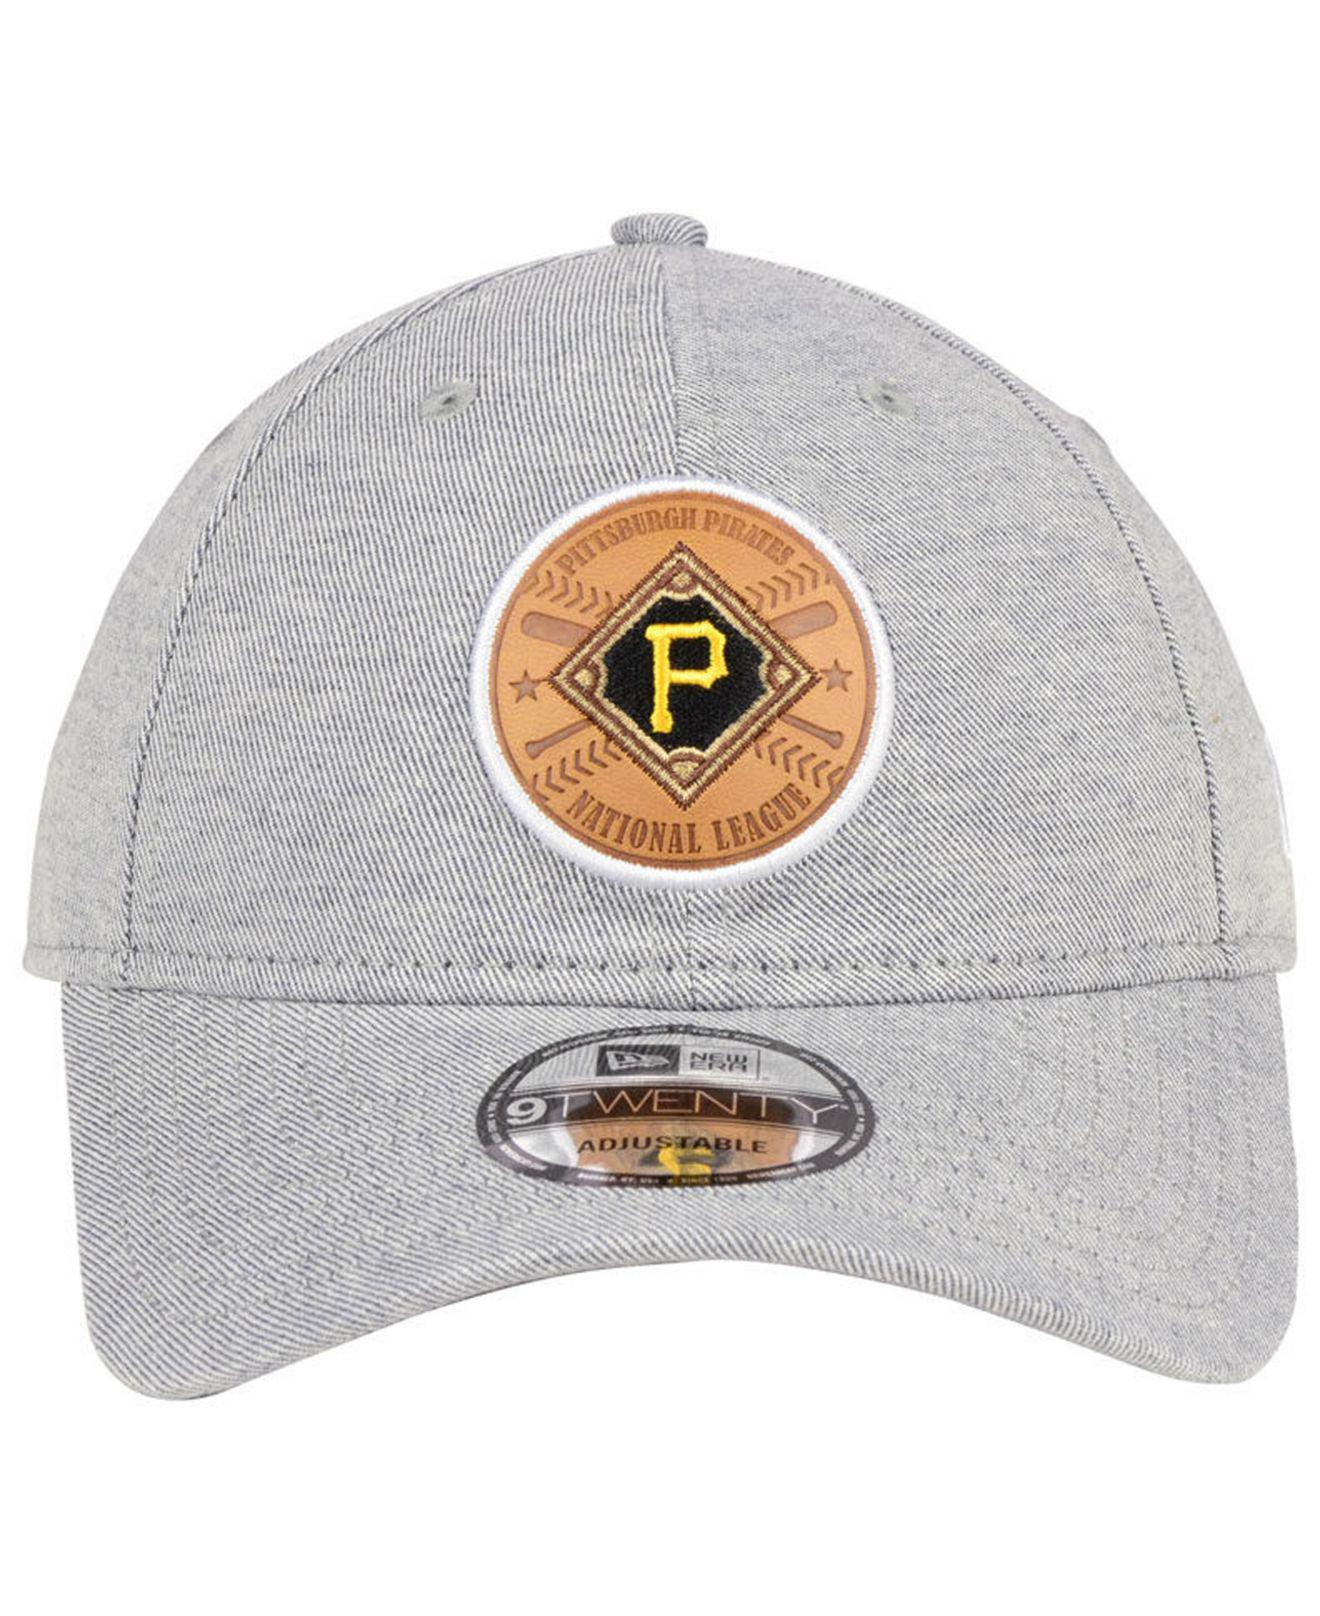 0c01fd2a4145f9 ... shop lyst ktz pittsburgh pirates round tripper 9twenty cap for men  30df4 fdf1d